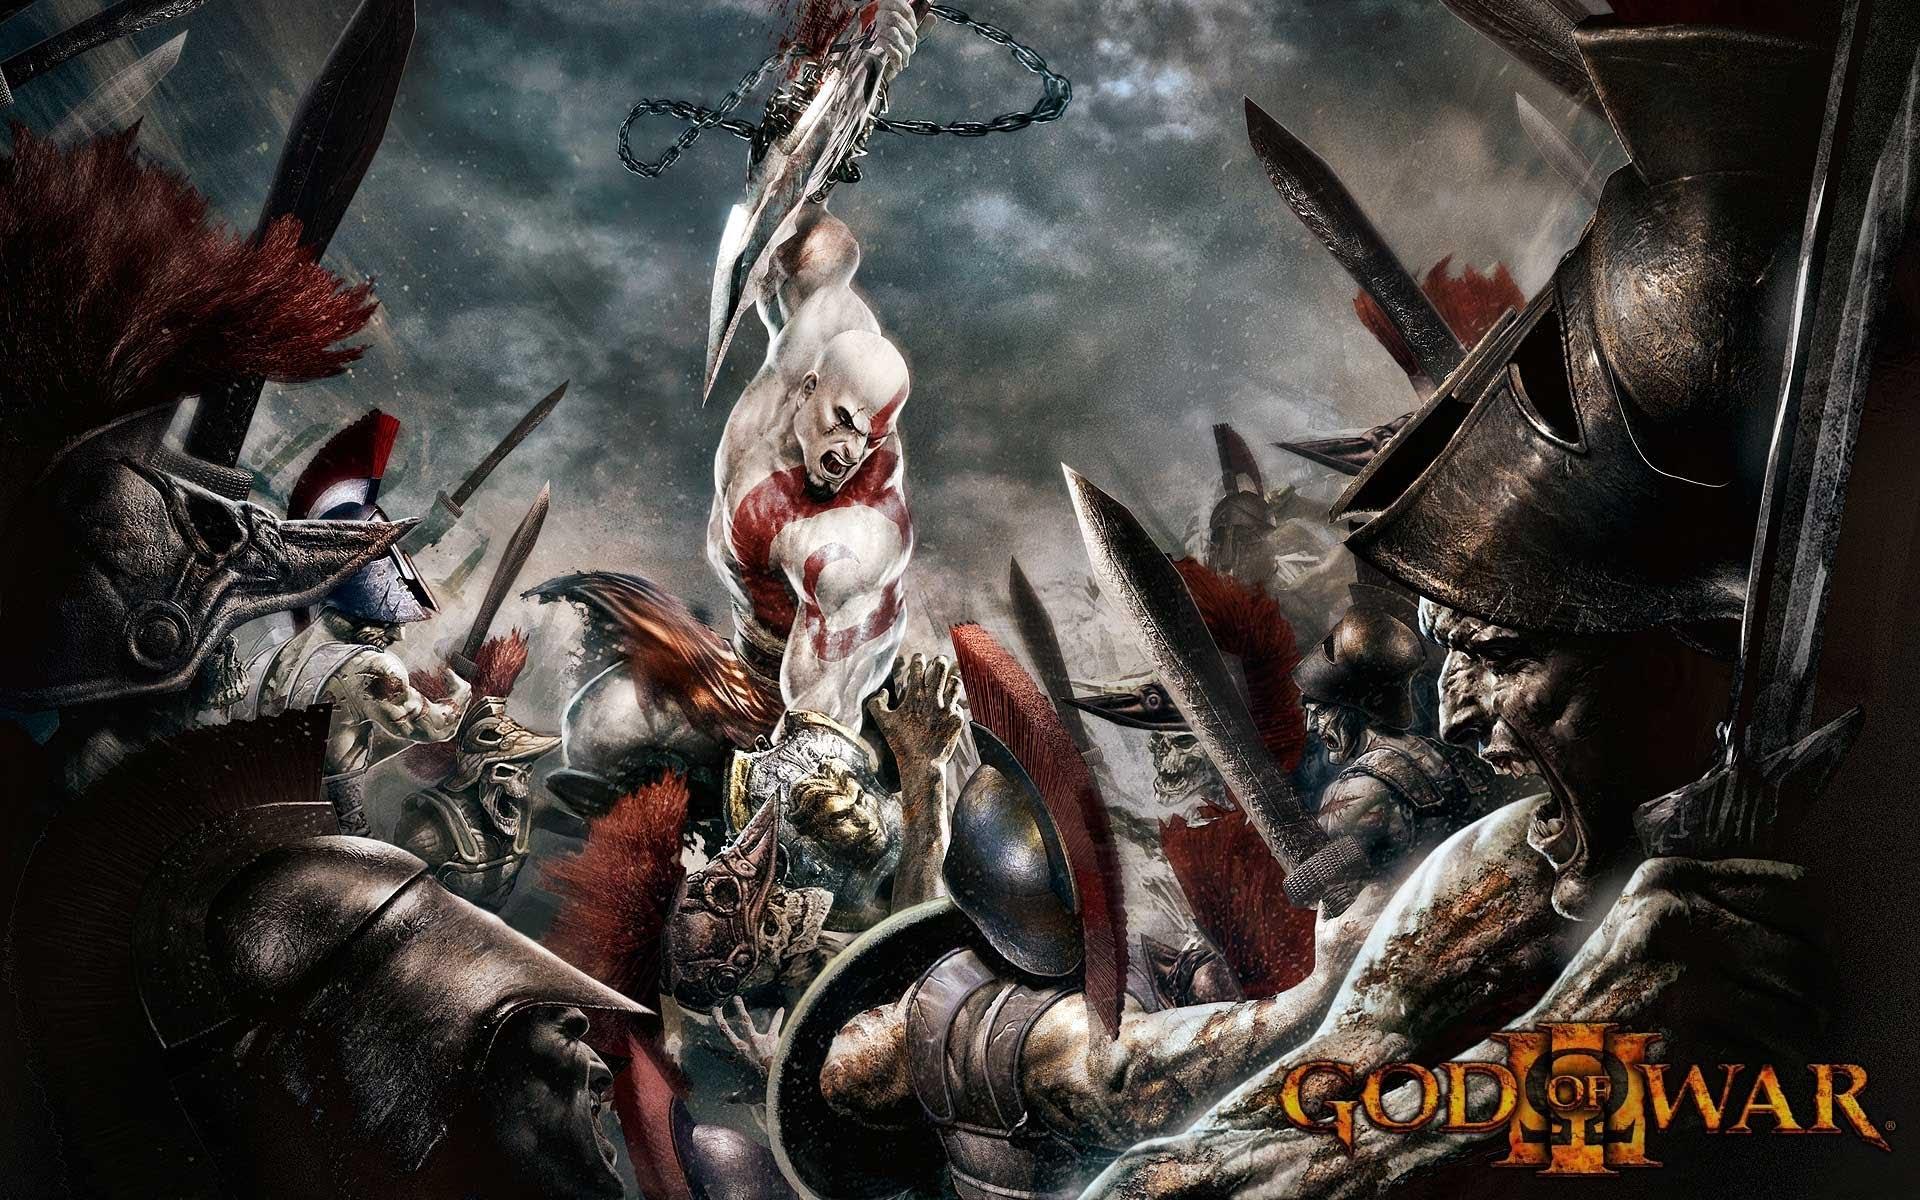 god-of-war-3-fds-daily2k